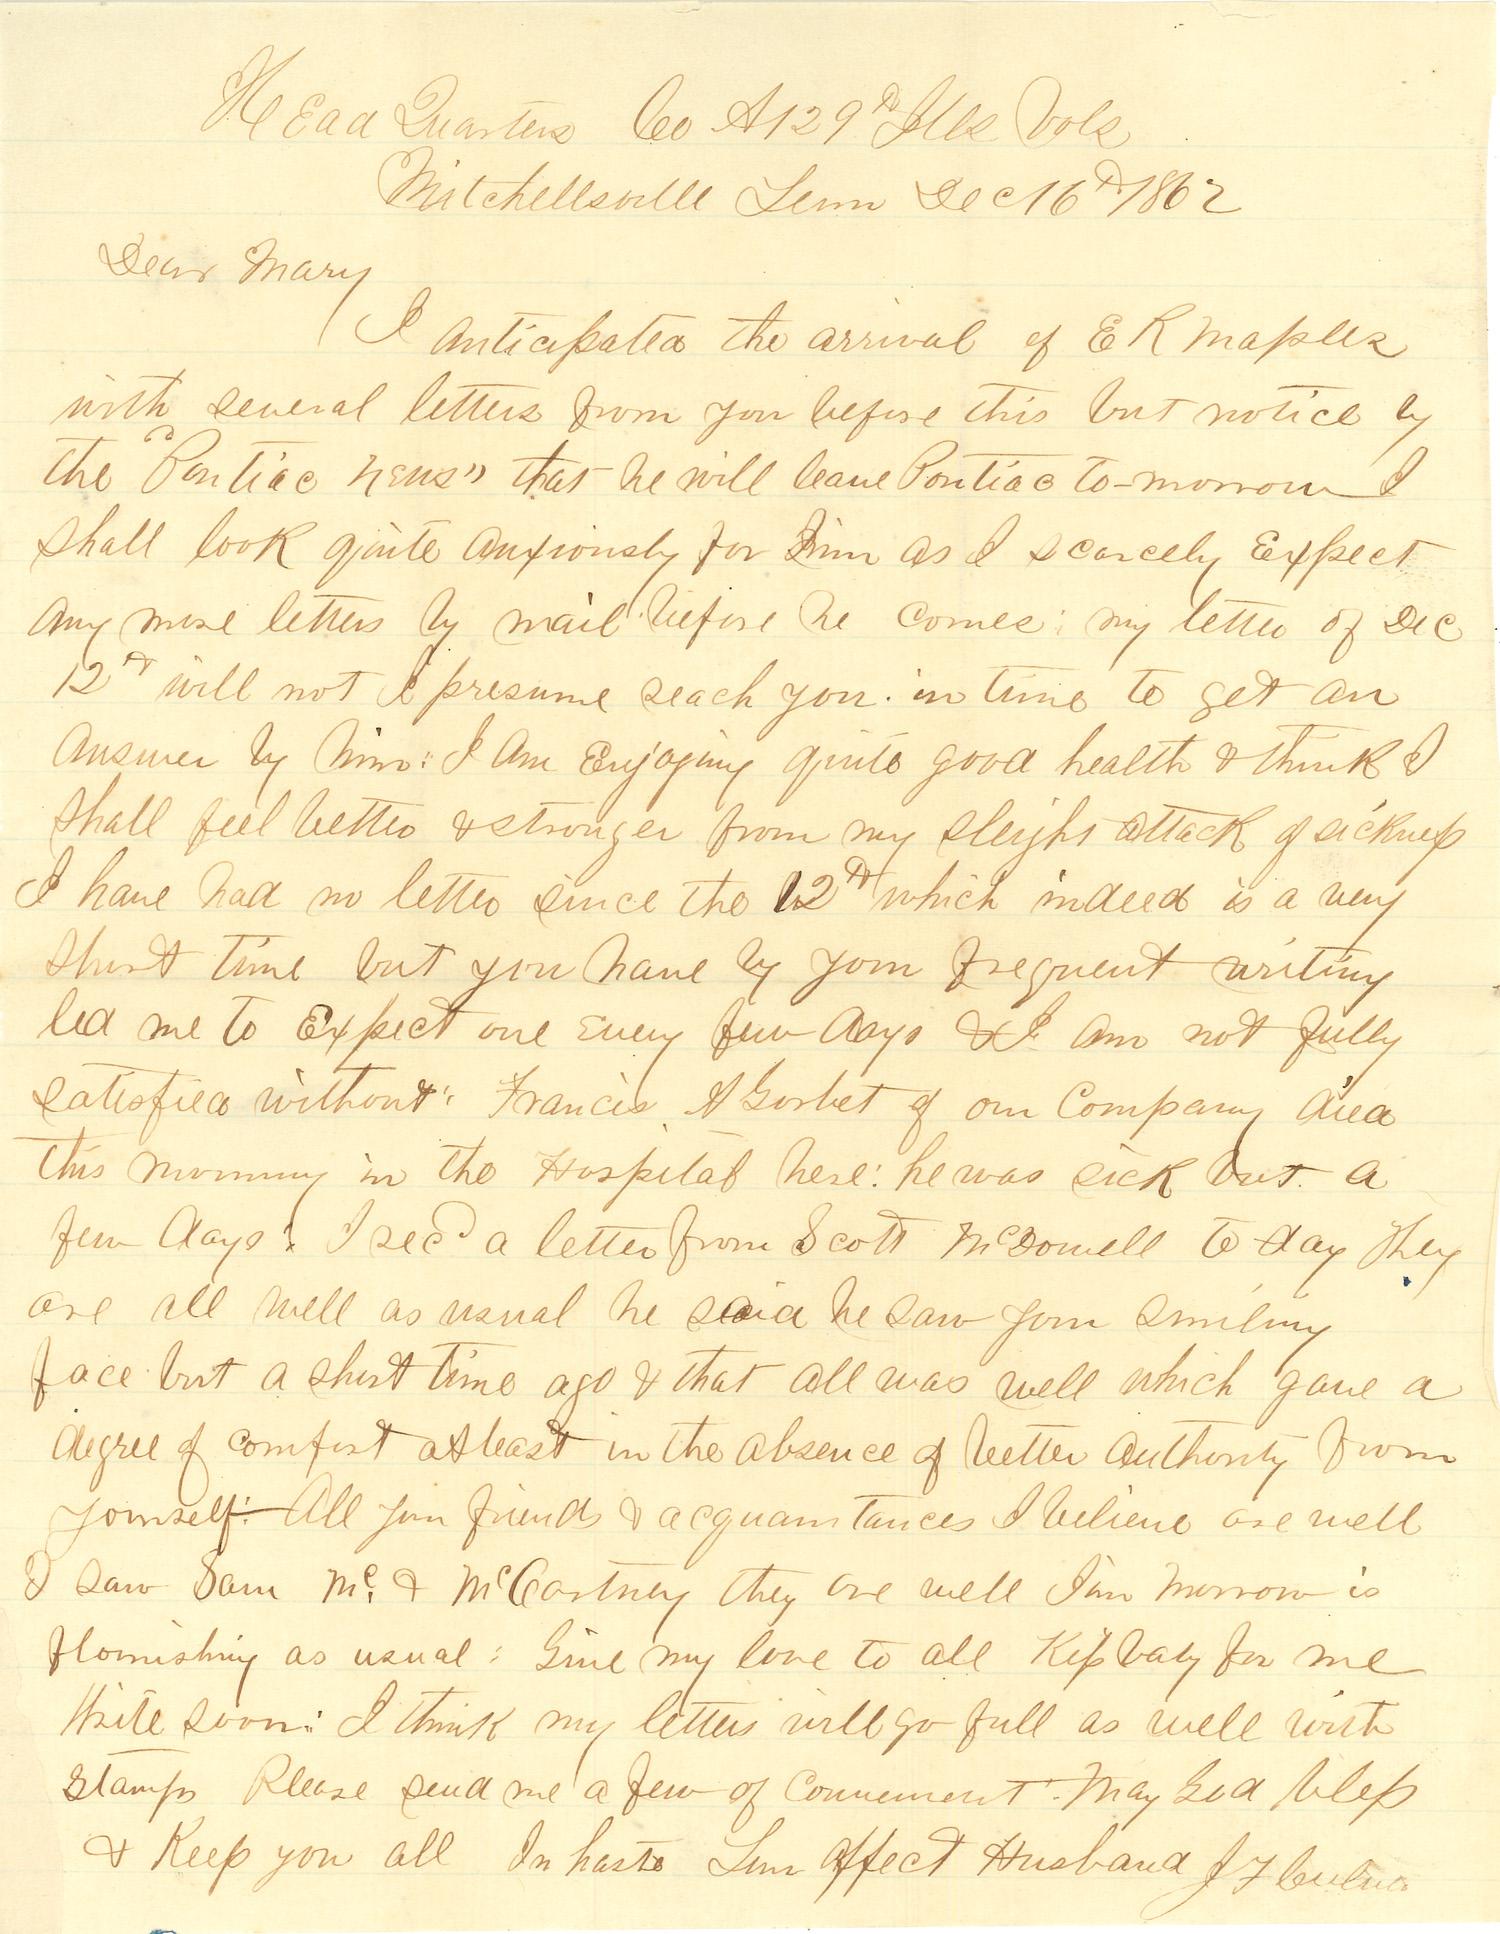 Joseph Culver Letter, December 16, 1862, Letter 2, Page 1